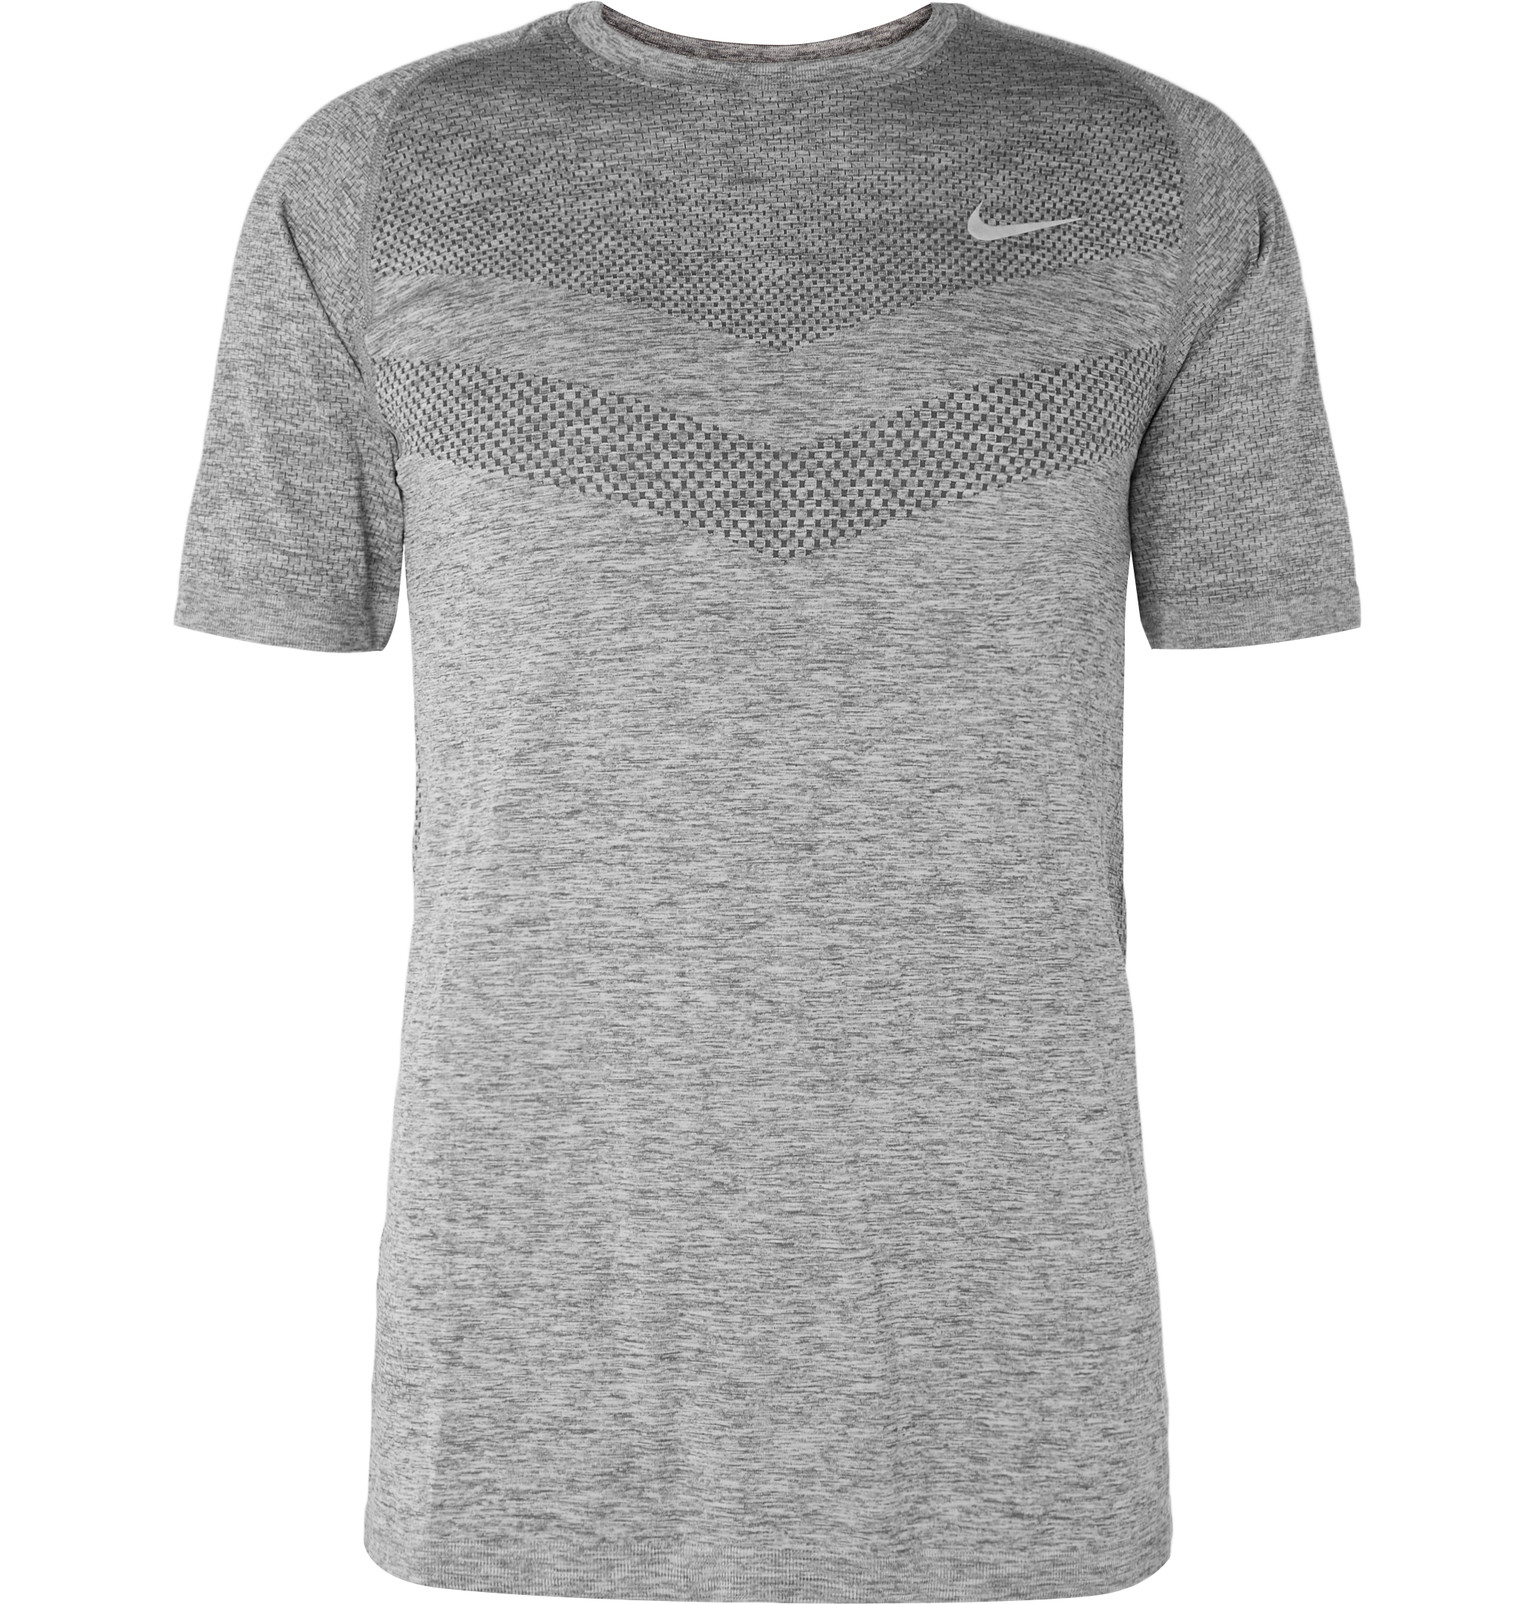 5fdd7b7a9e6 Nike Mélange Dri-fit T-shirt in Gray for Men - Lyst